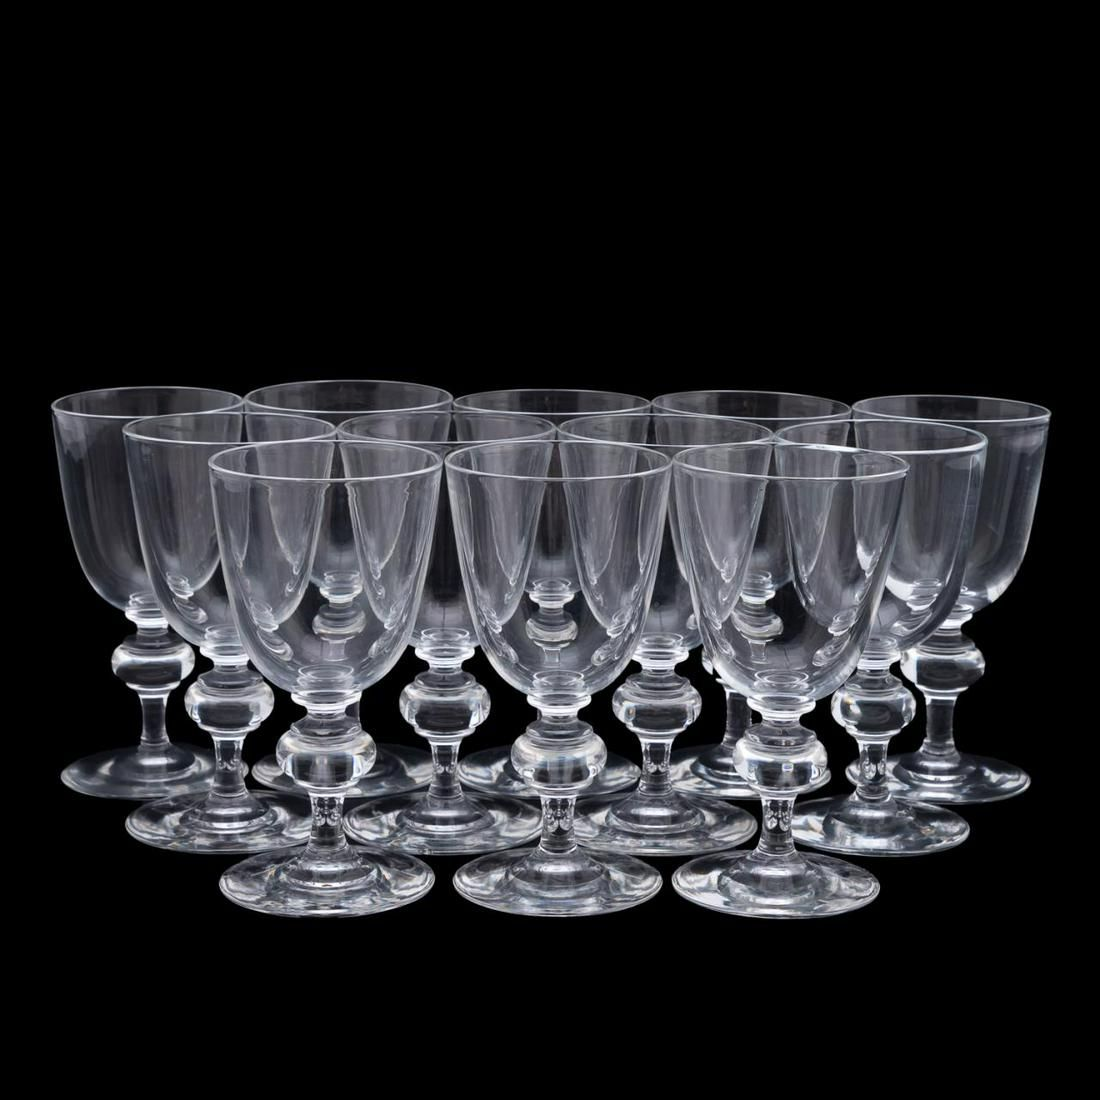 SET OF 12 STEUBEN RED WINE GLASSES, PATTERN 7925